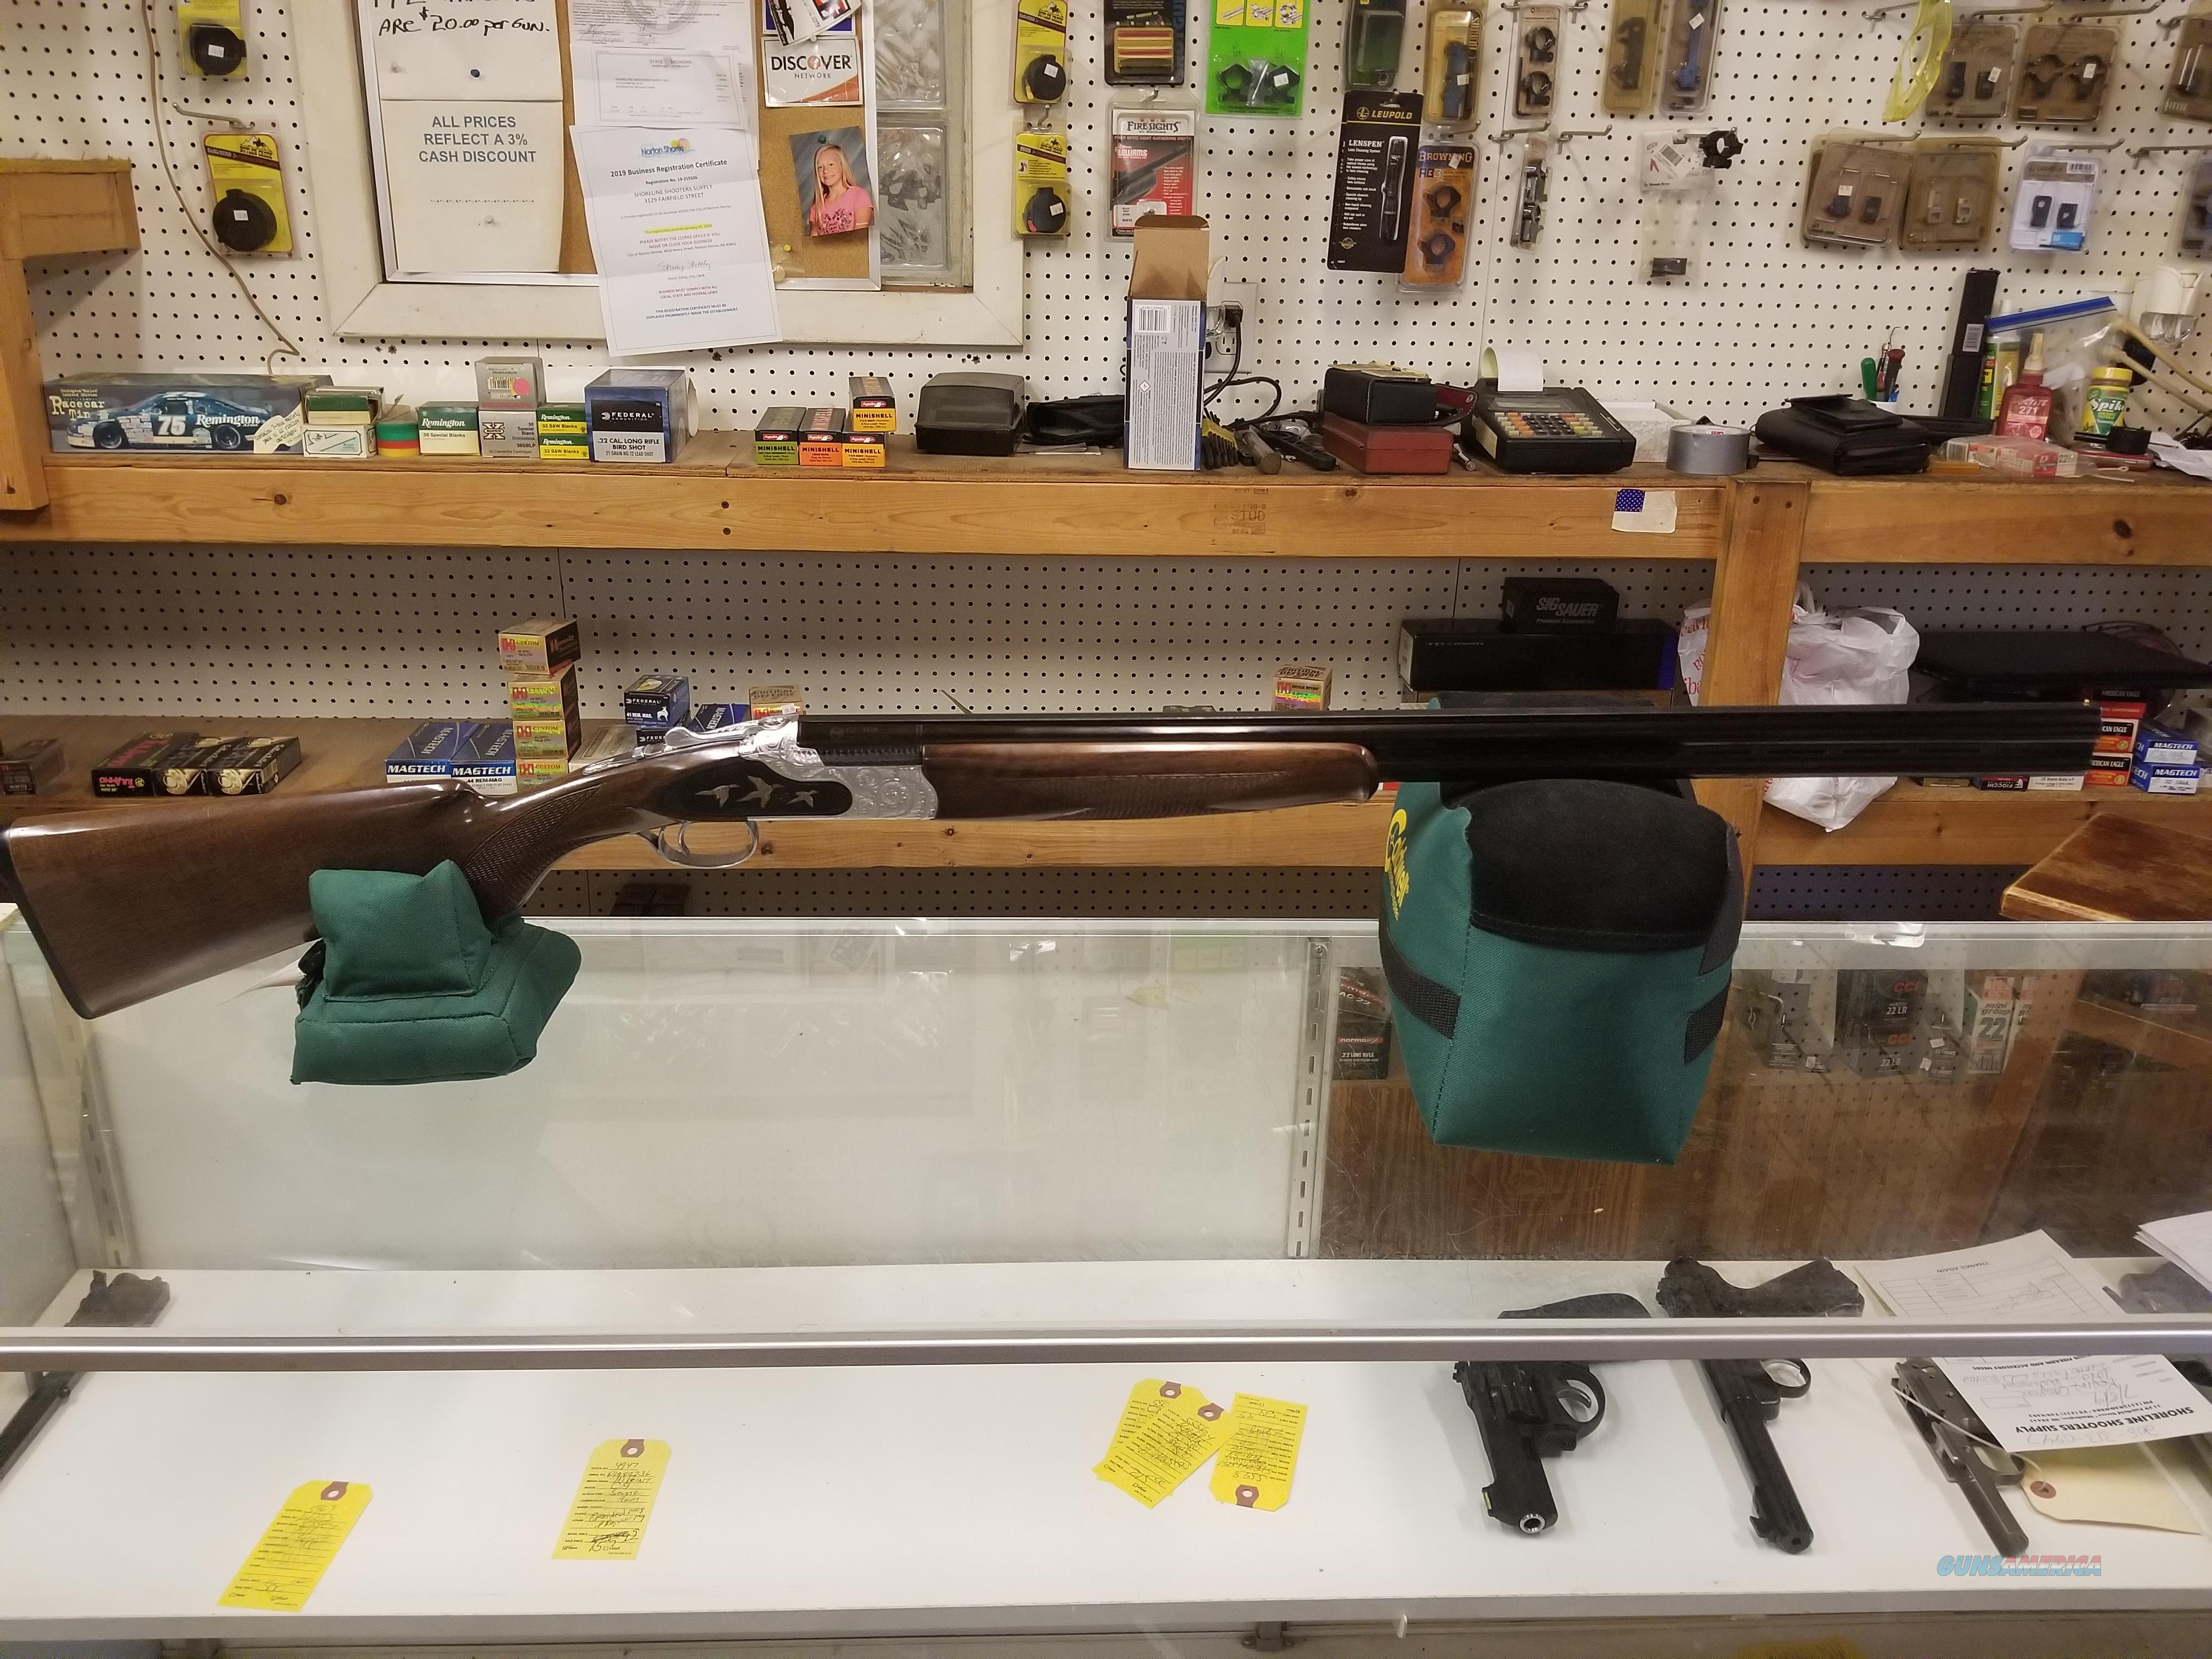 CZ WINGSHOOTER 20 GAUGE O/U  Guns > Shotguns > CZ Shotguns